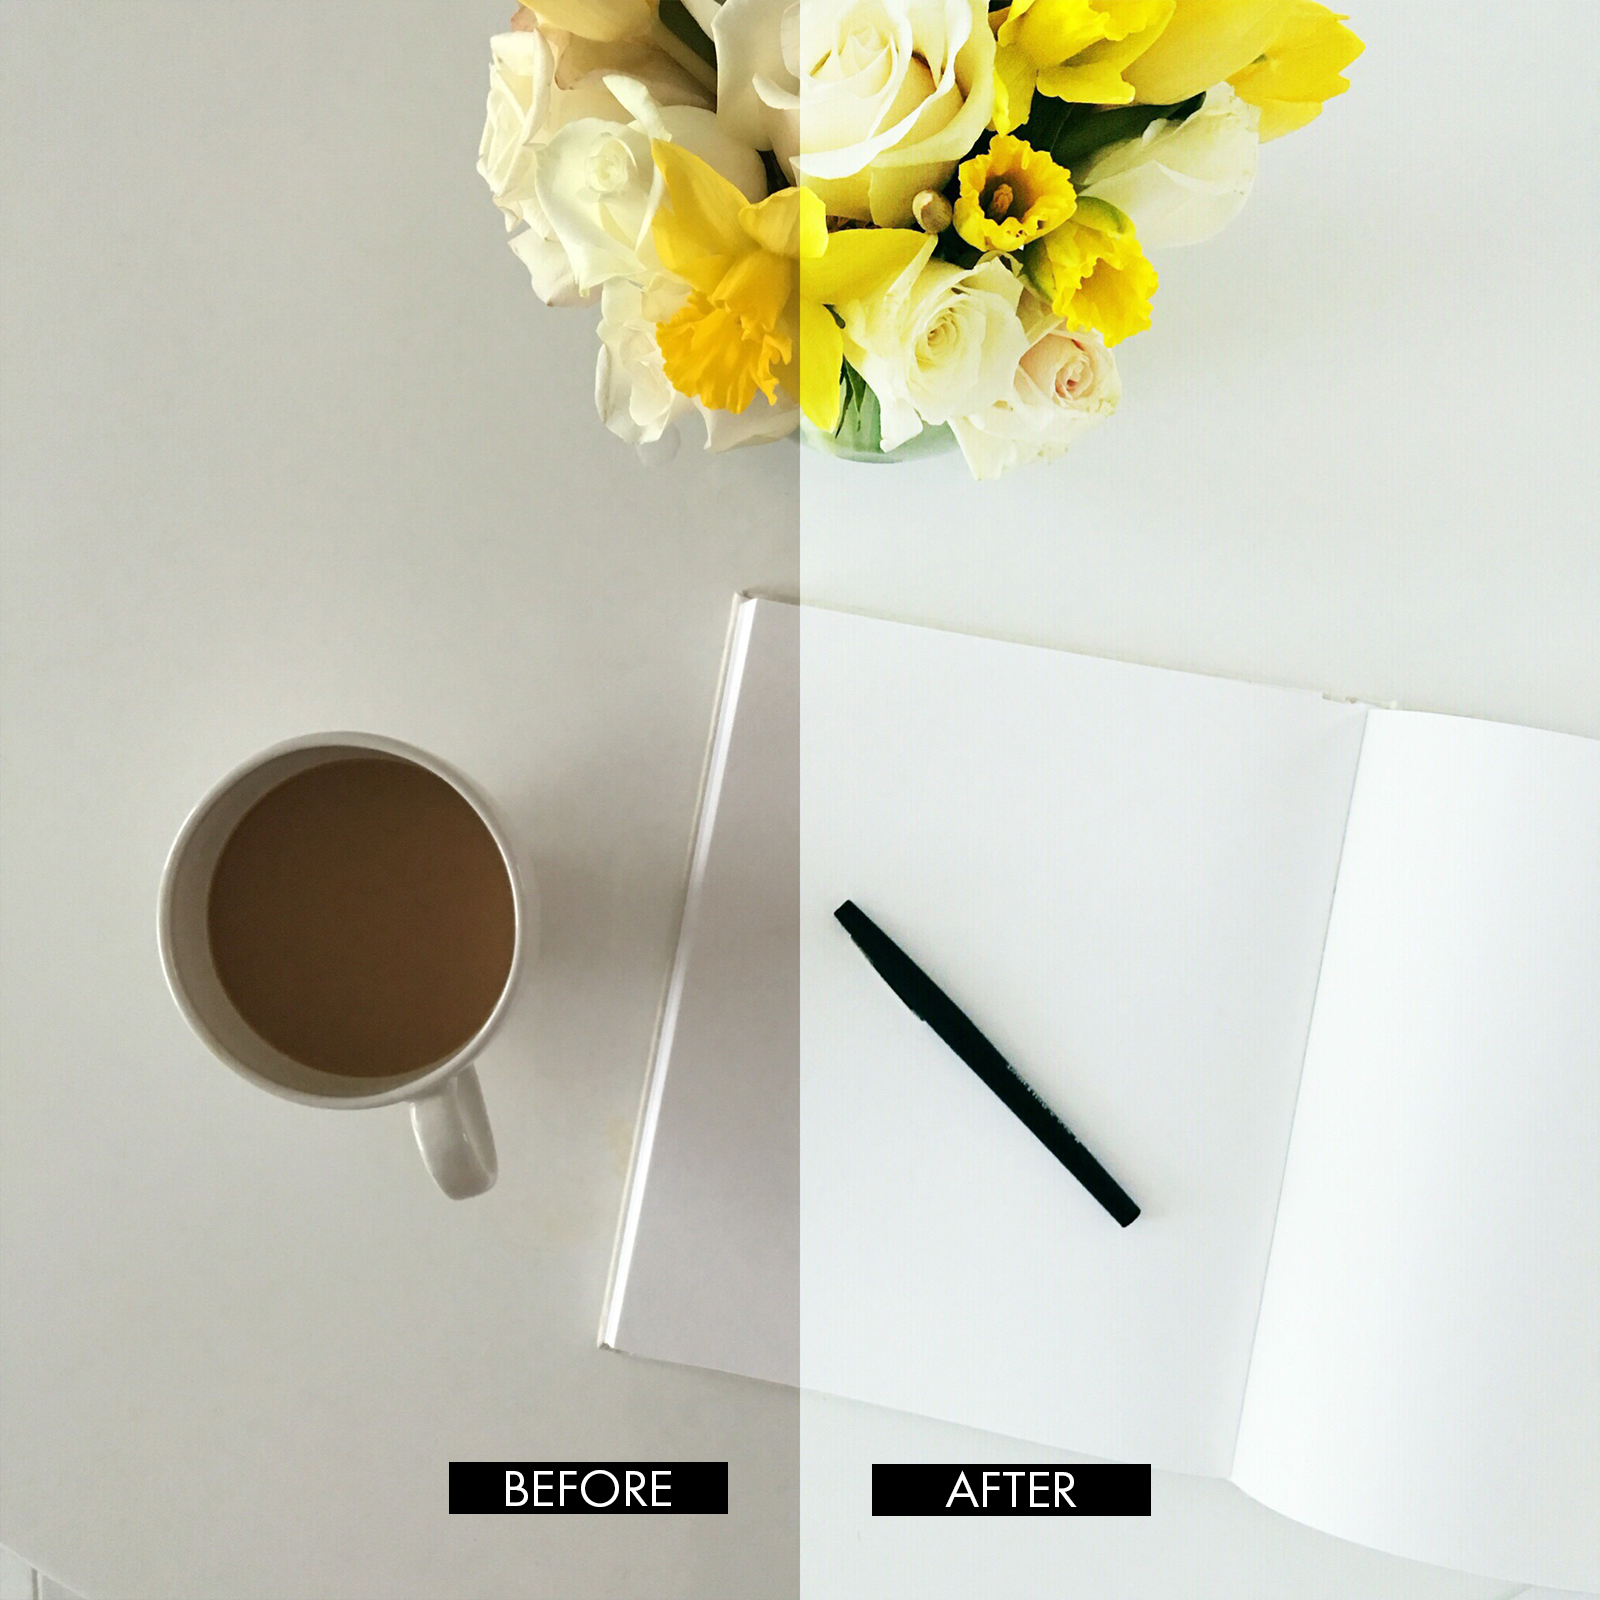 2016-03-24 Flower, pad, coffee